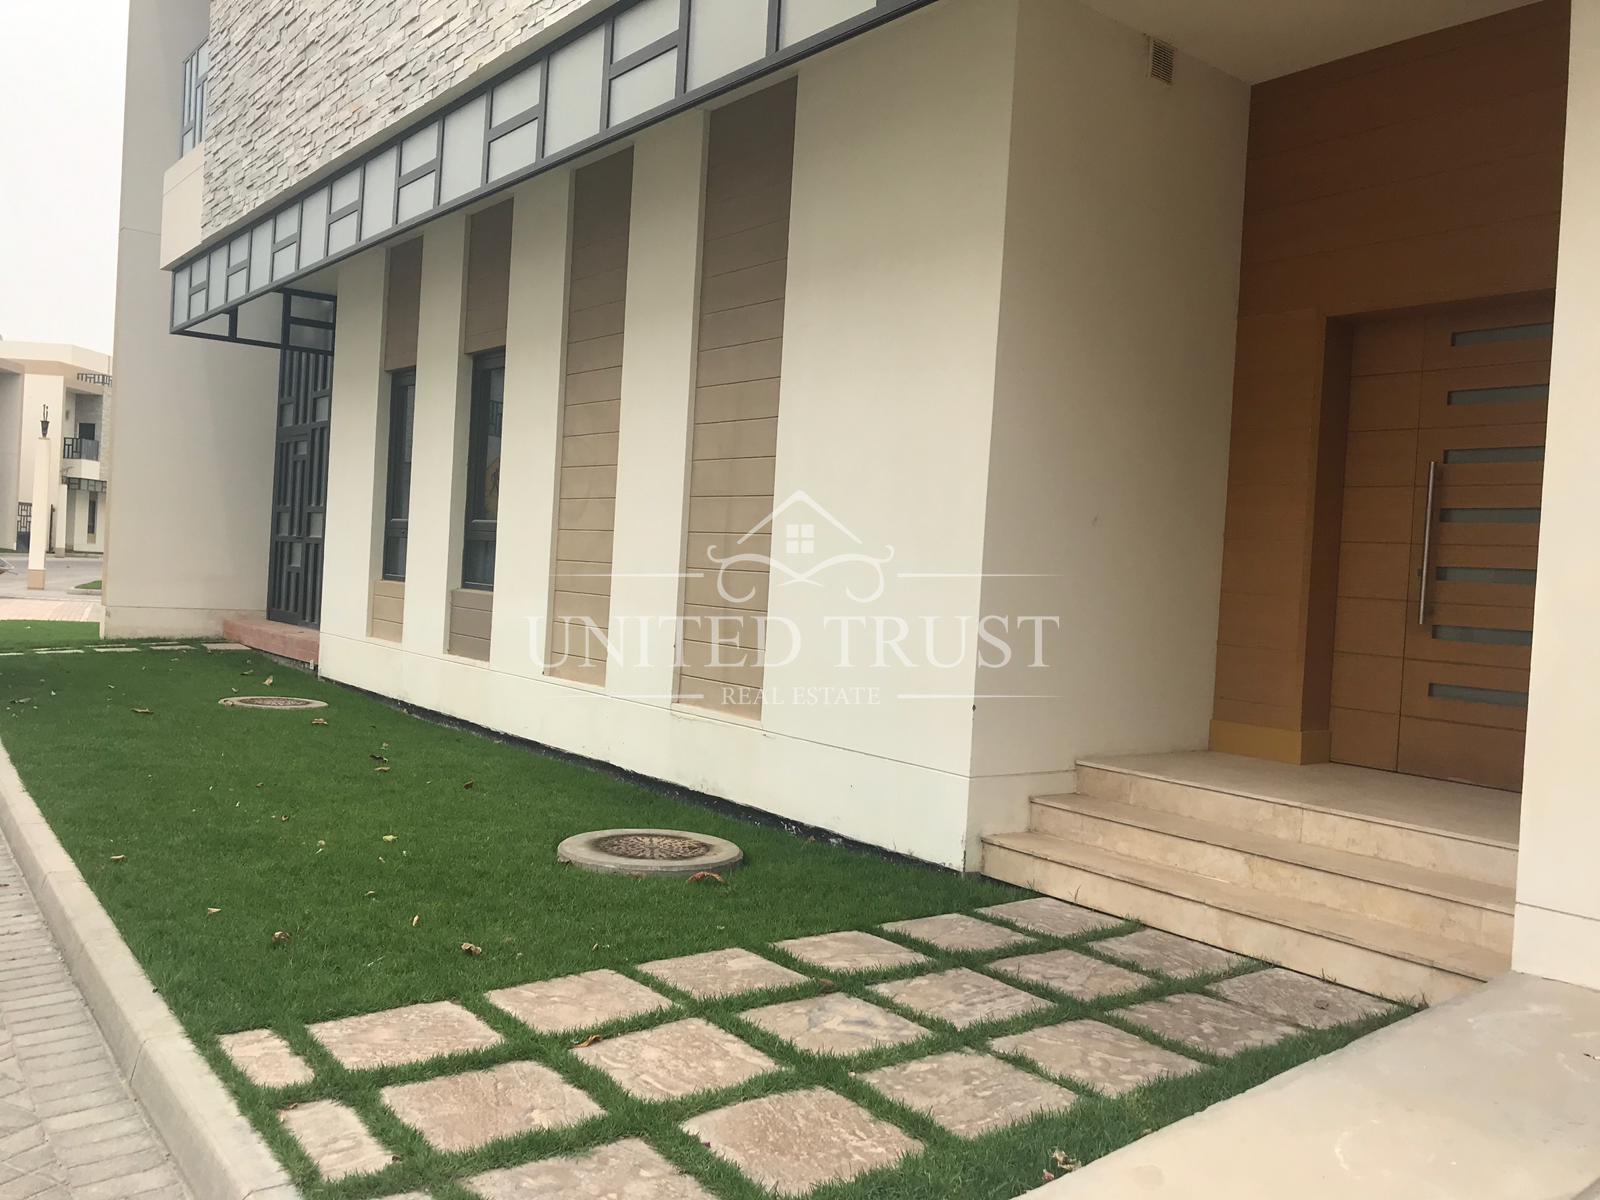 For Rent Luxury Villa in Zallaq Ref: ZAL-SB-003